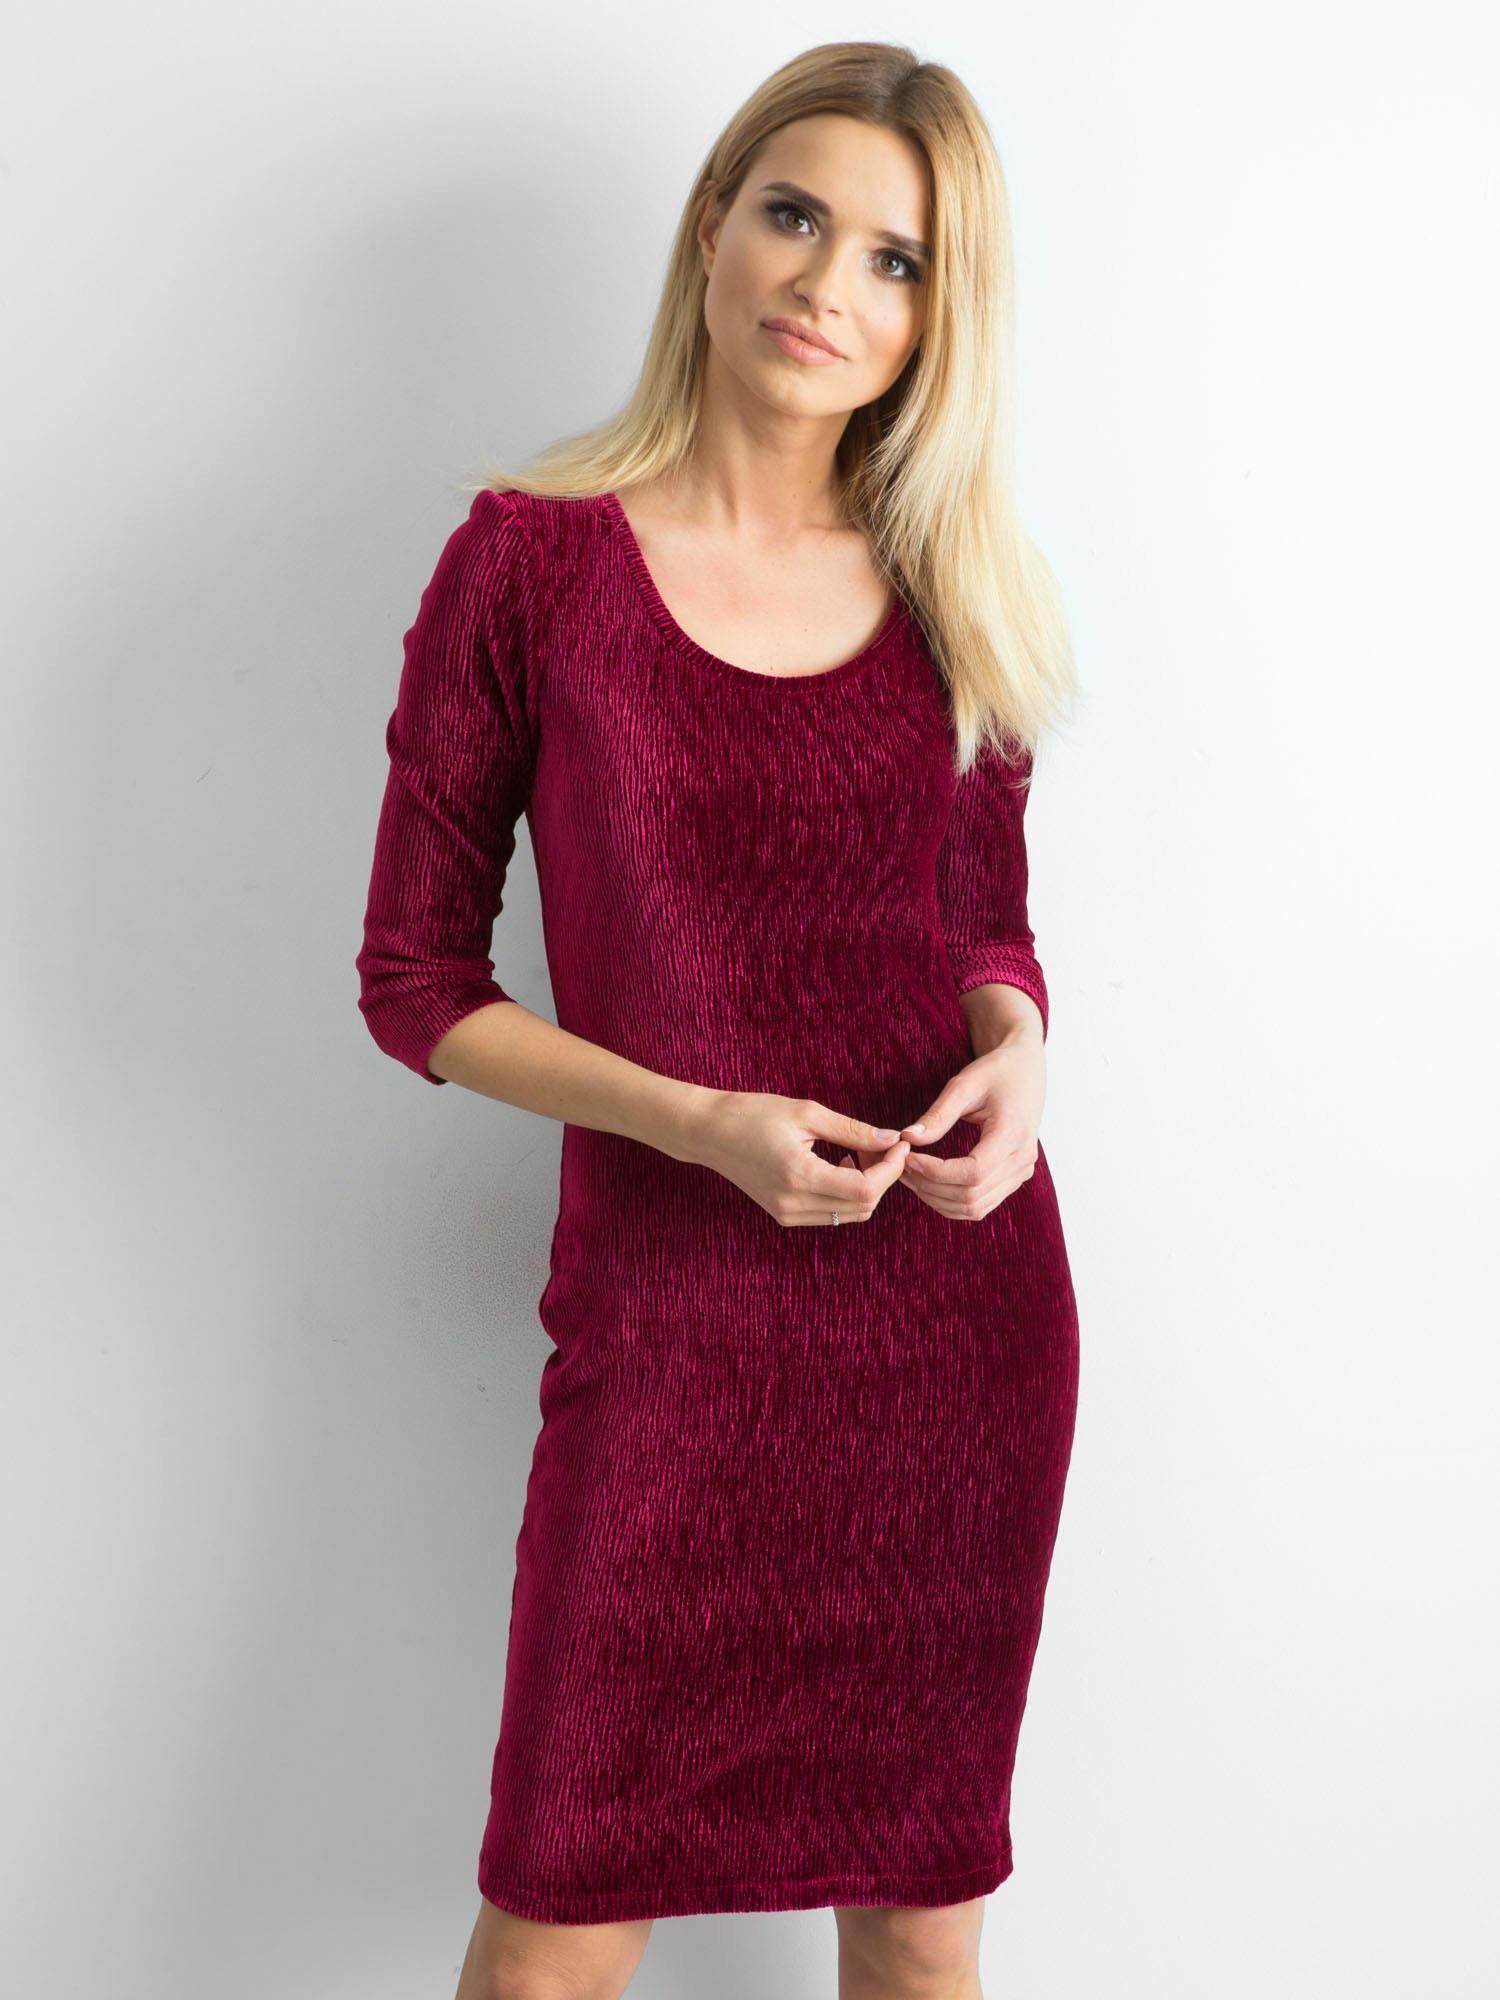 bfb89a3faa845a Bordowa dopasowana welurowa sukienka - Sukienka dopasowana - sklep ...